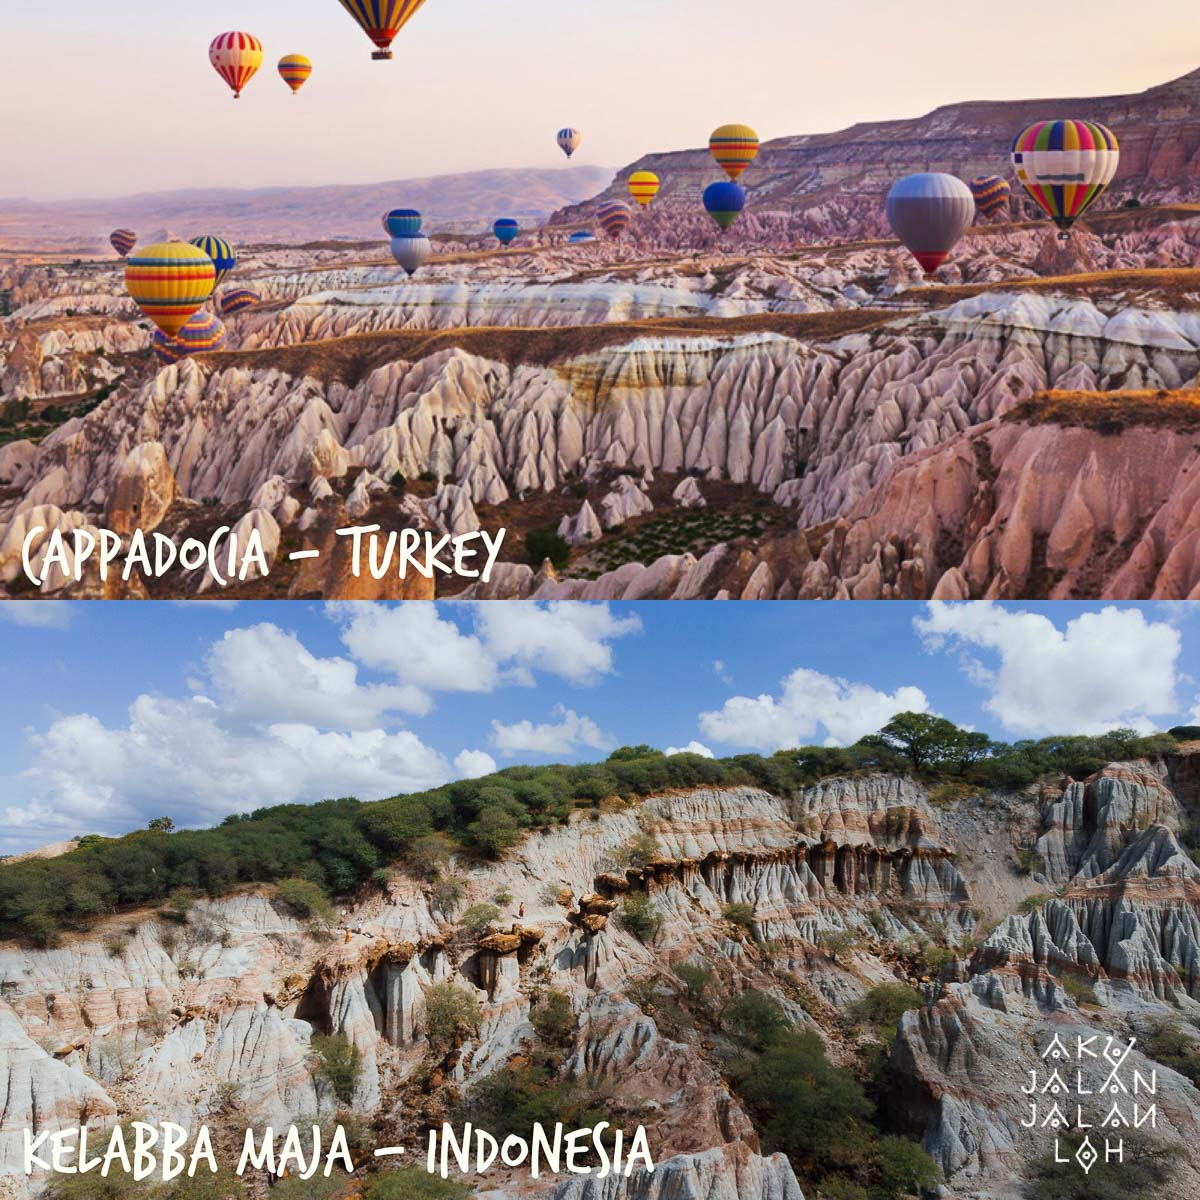 Mirip Cappadocia kaga ni?